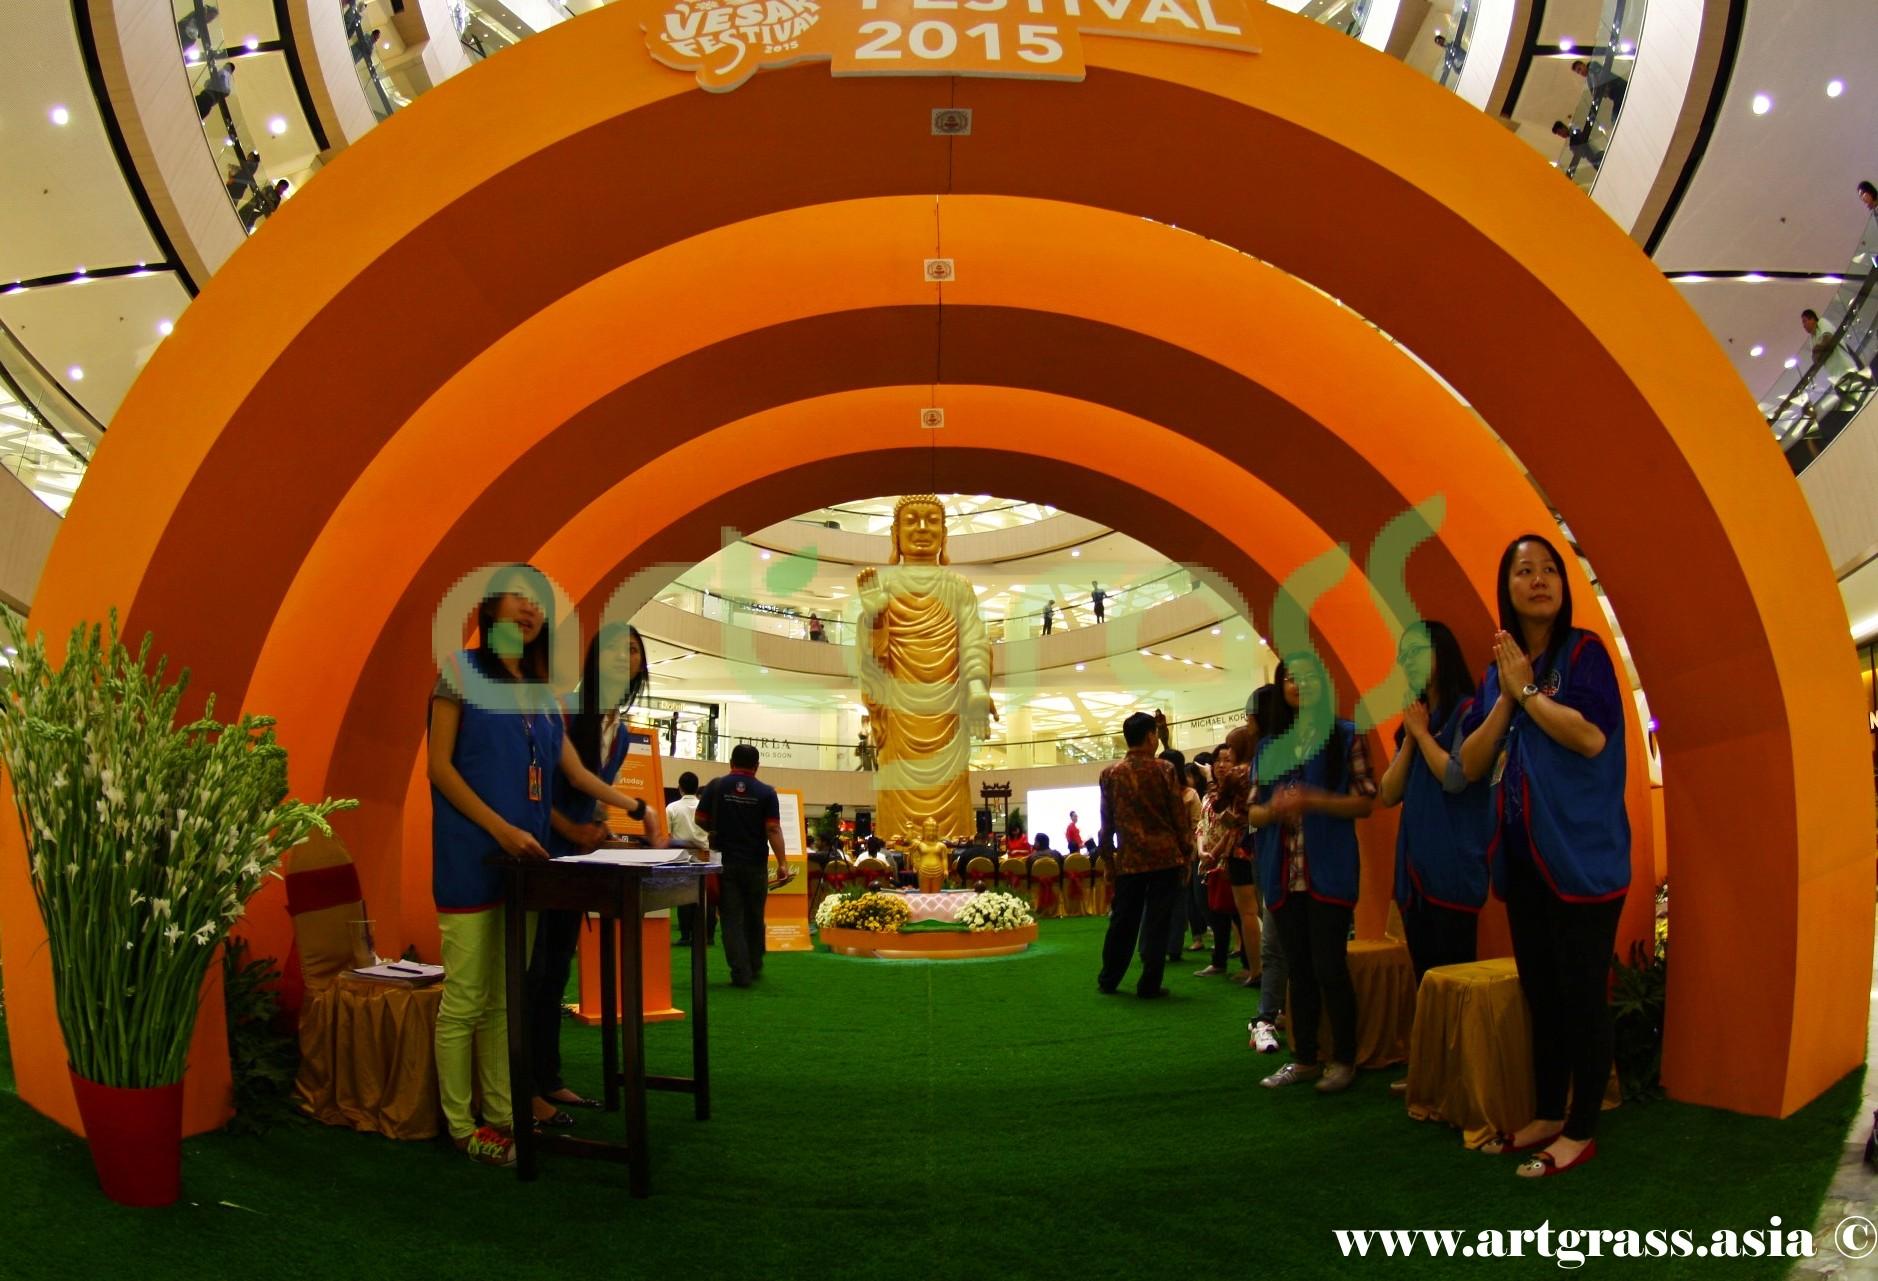 ArtGrass-At-Vesak-Festival-2015-Main-Atrium-Tunjungan-Plaza-28Mei-2015-MainEntrance